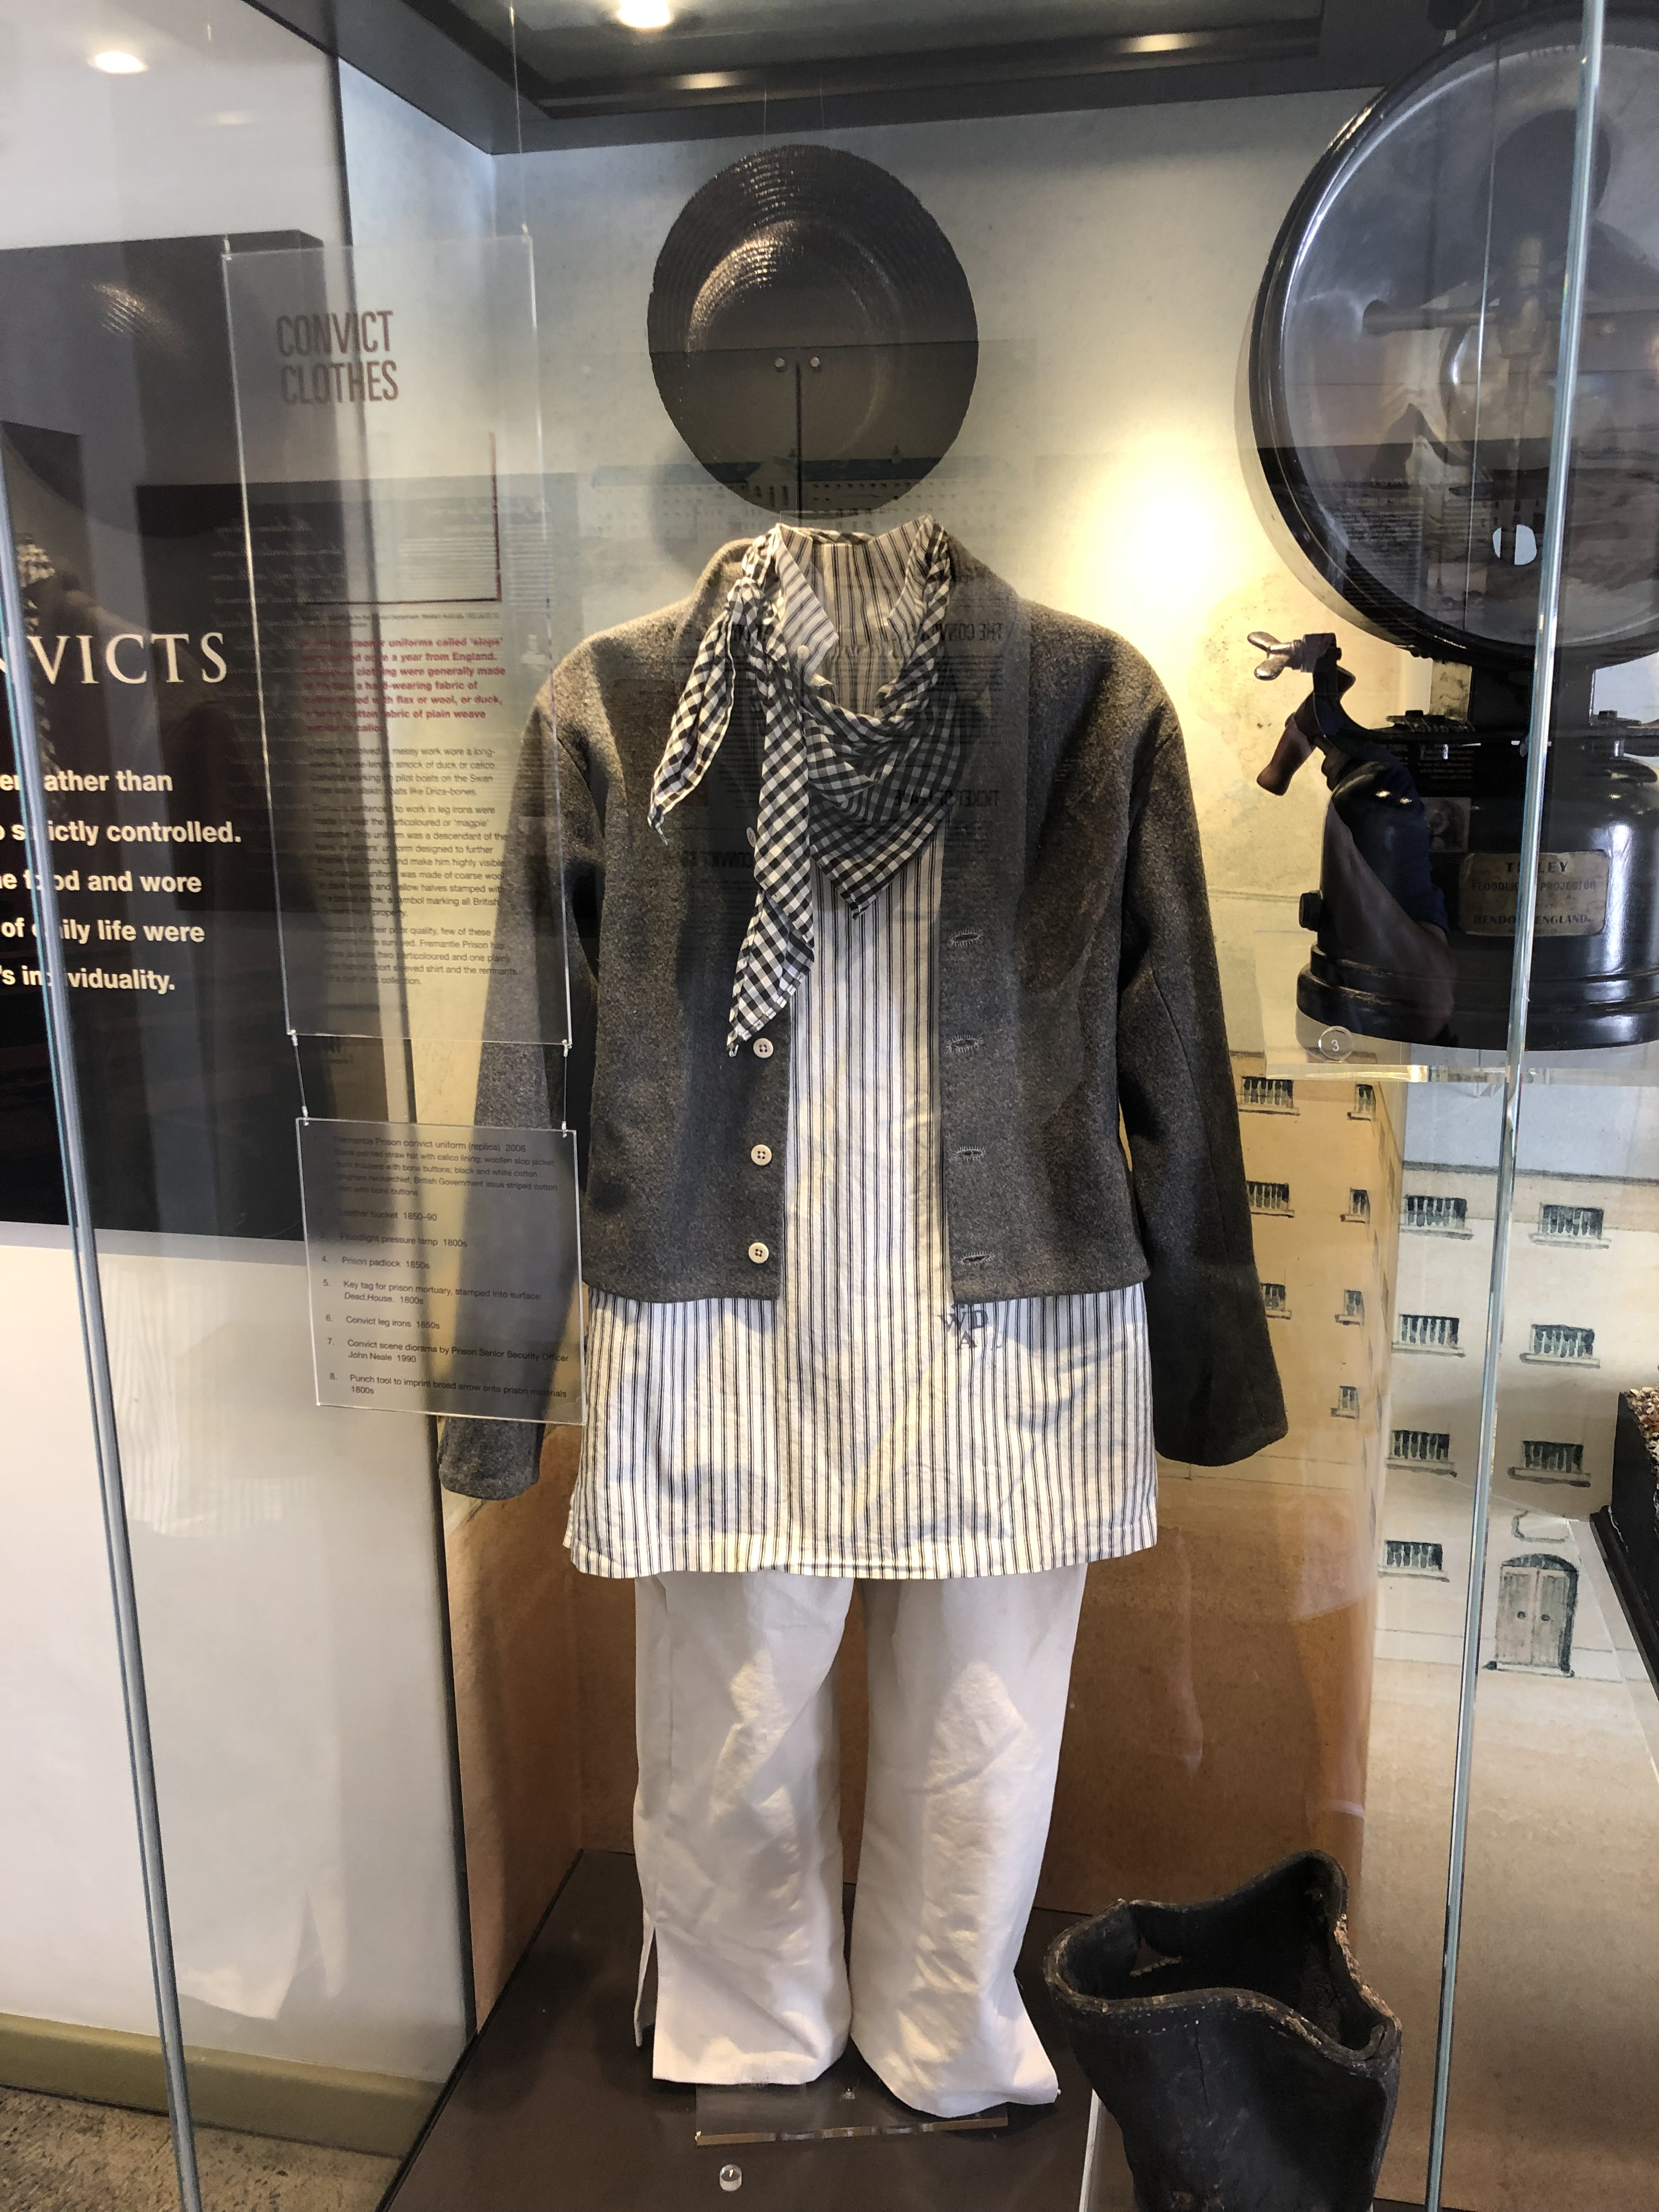 'The Slops': Convict Uniform